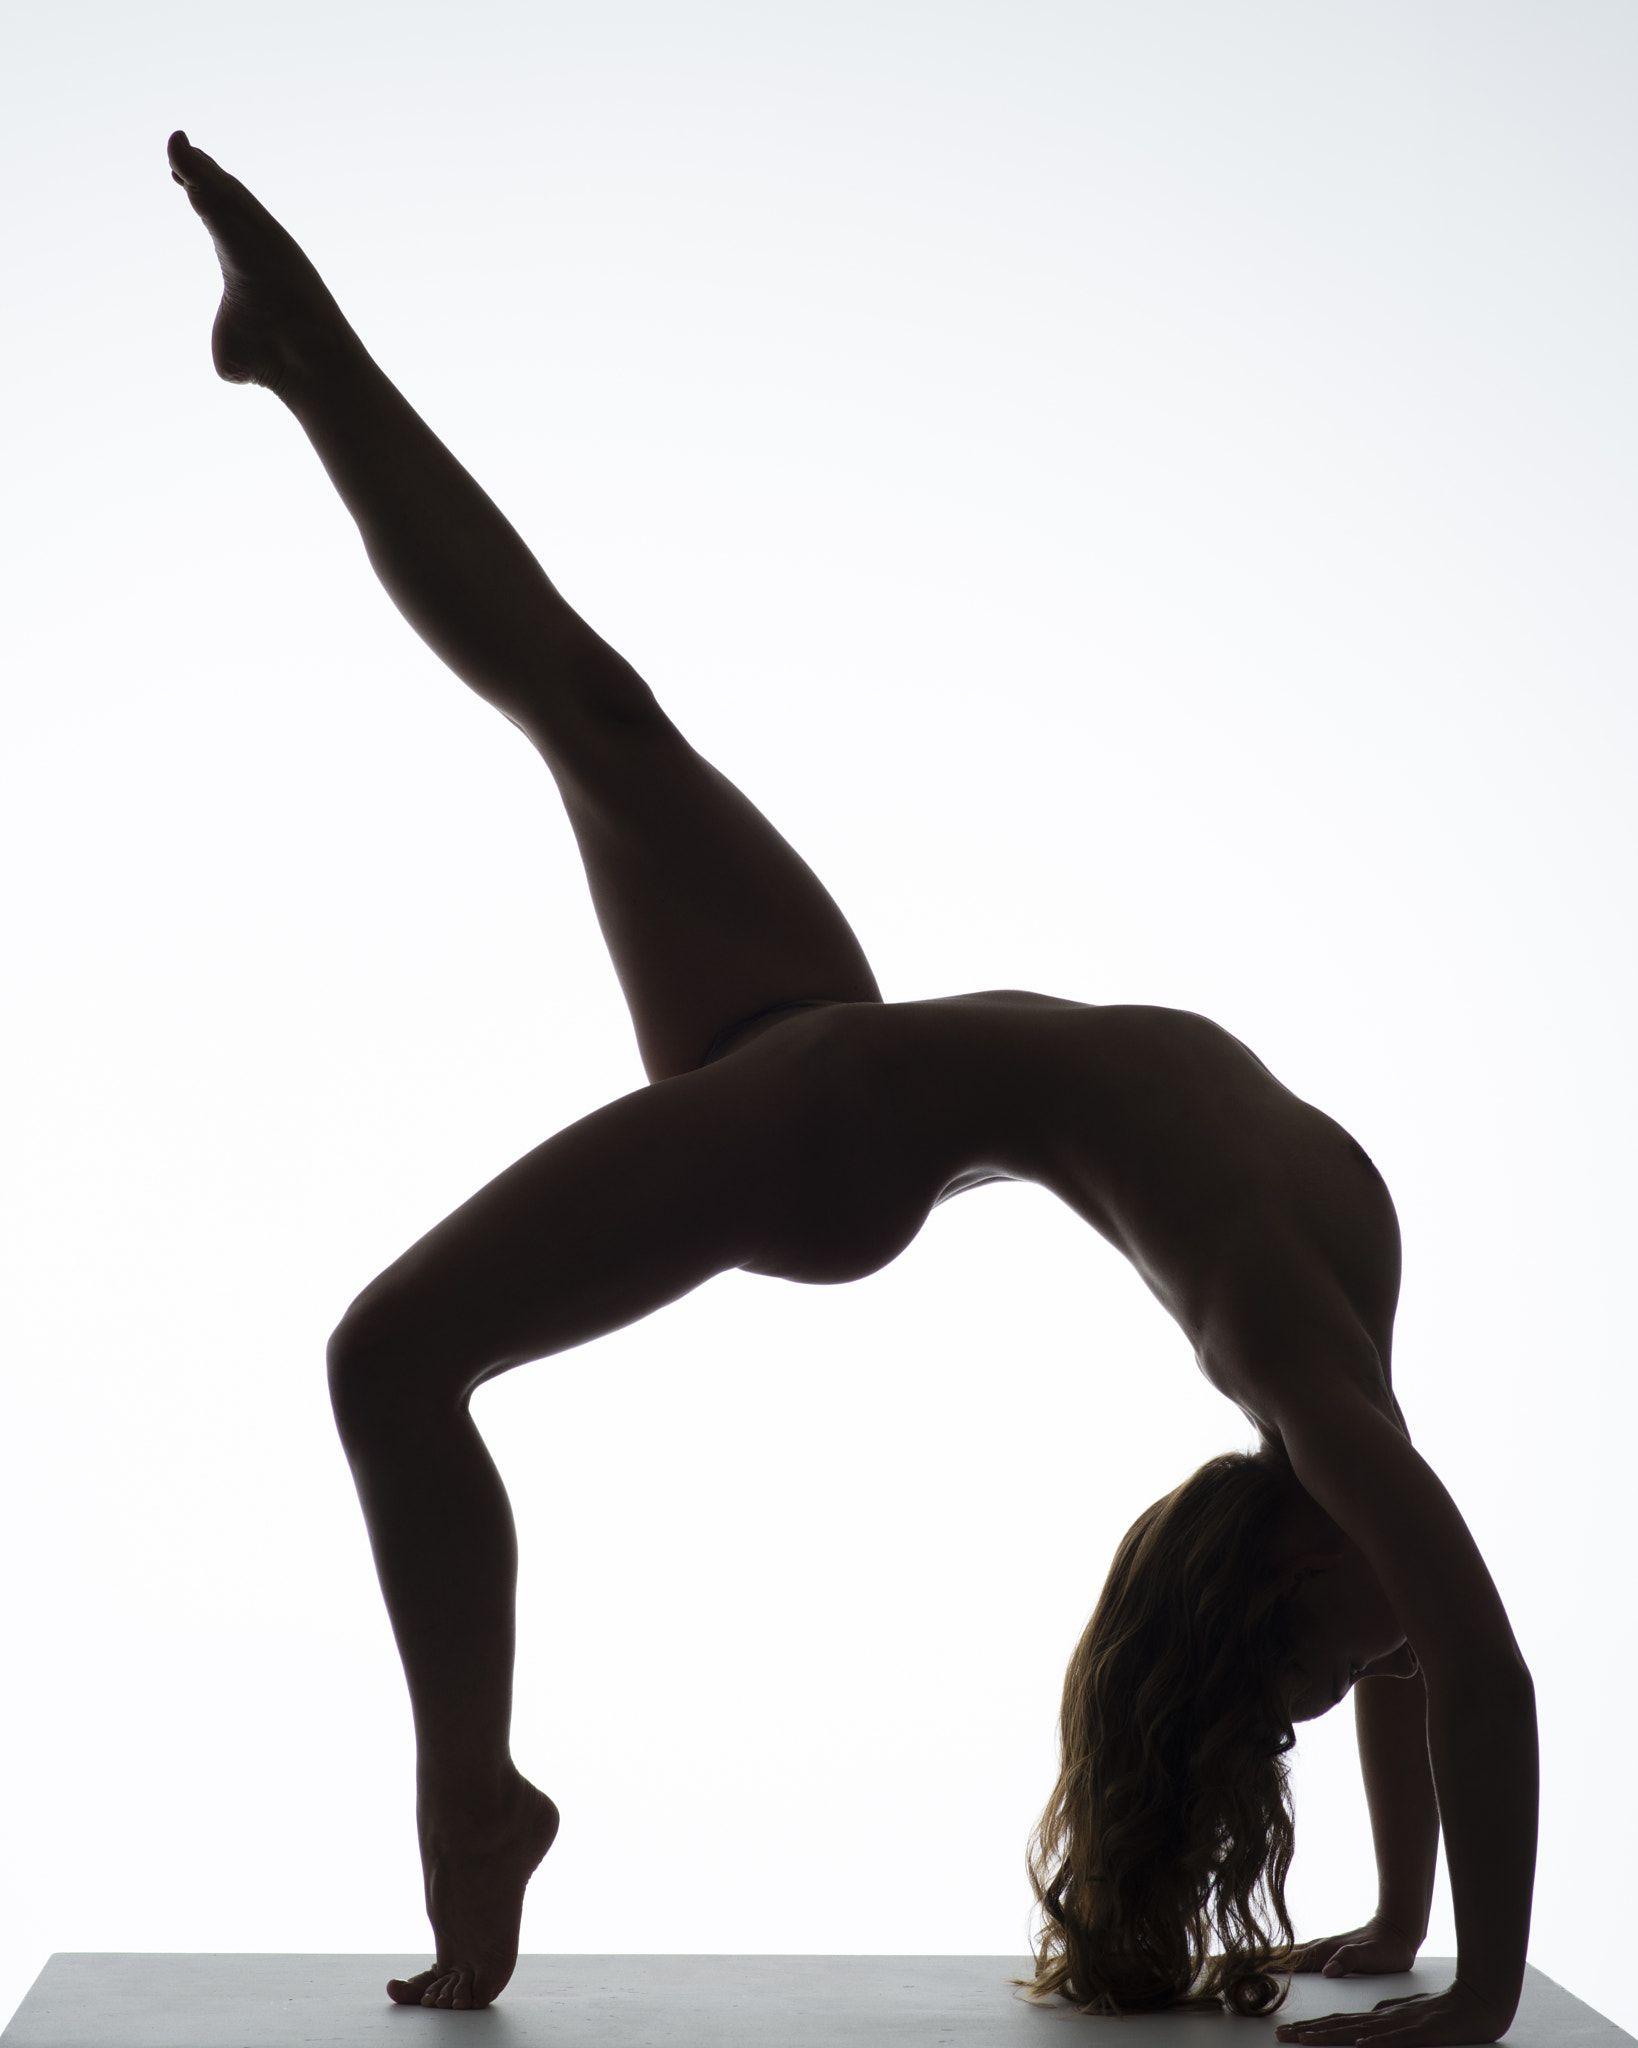 Opinion, actual, young girl nude yoga flexible apologise, but